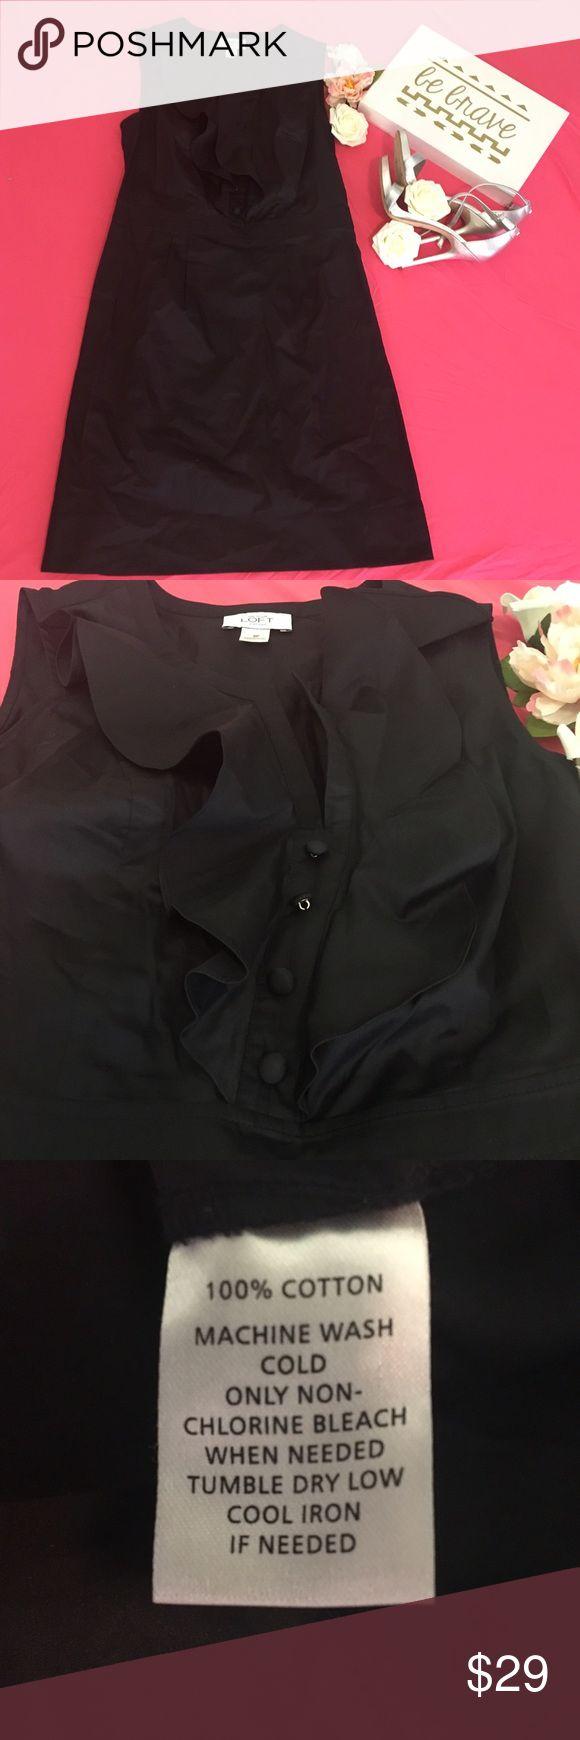 ANN TAYLOR LOFT DRESS SIZE 8 UNWORN Ann Taylor Loft dress size 8 black unworn LOFT Dresses